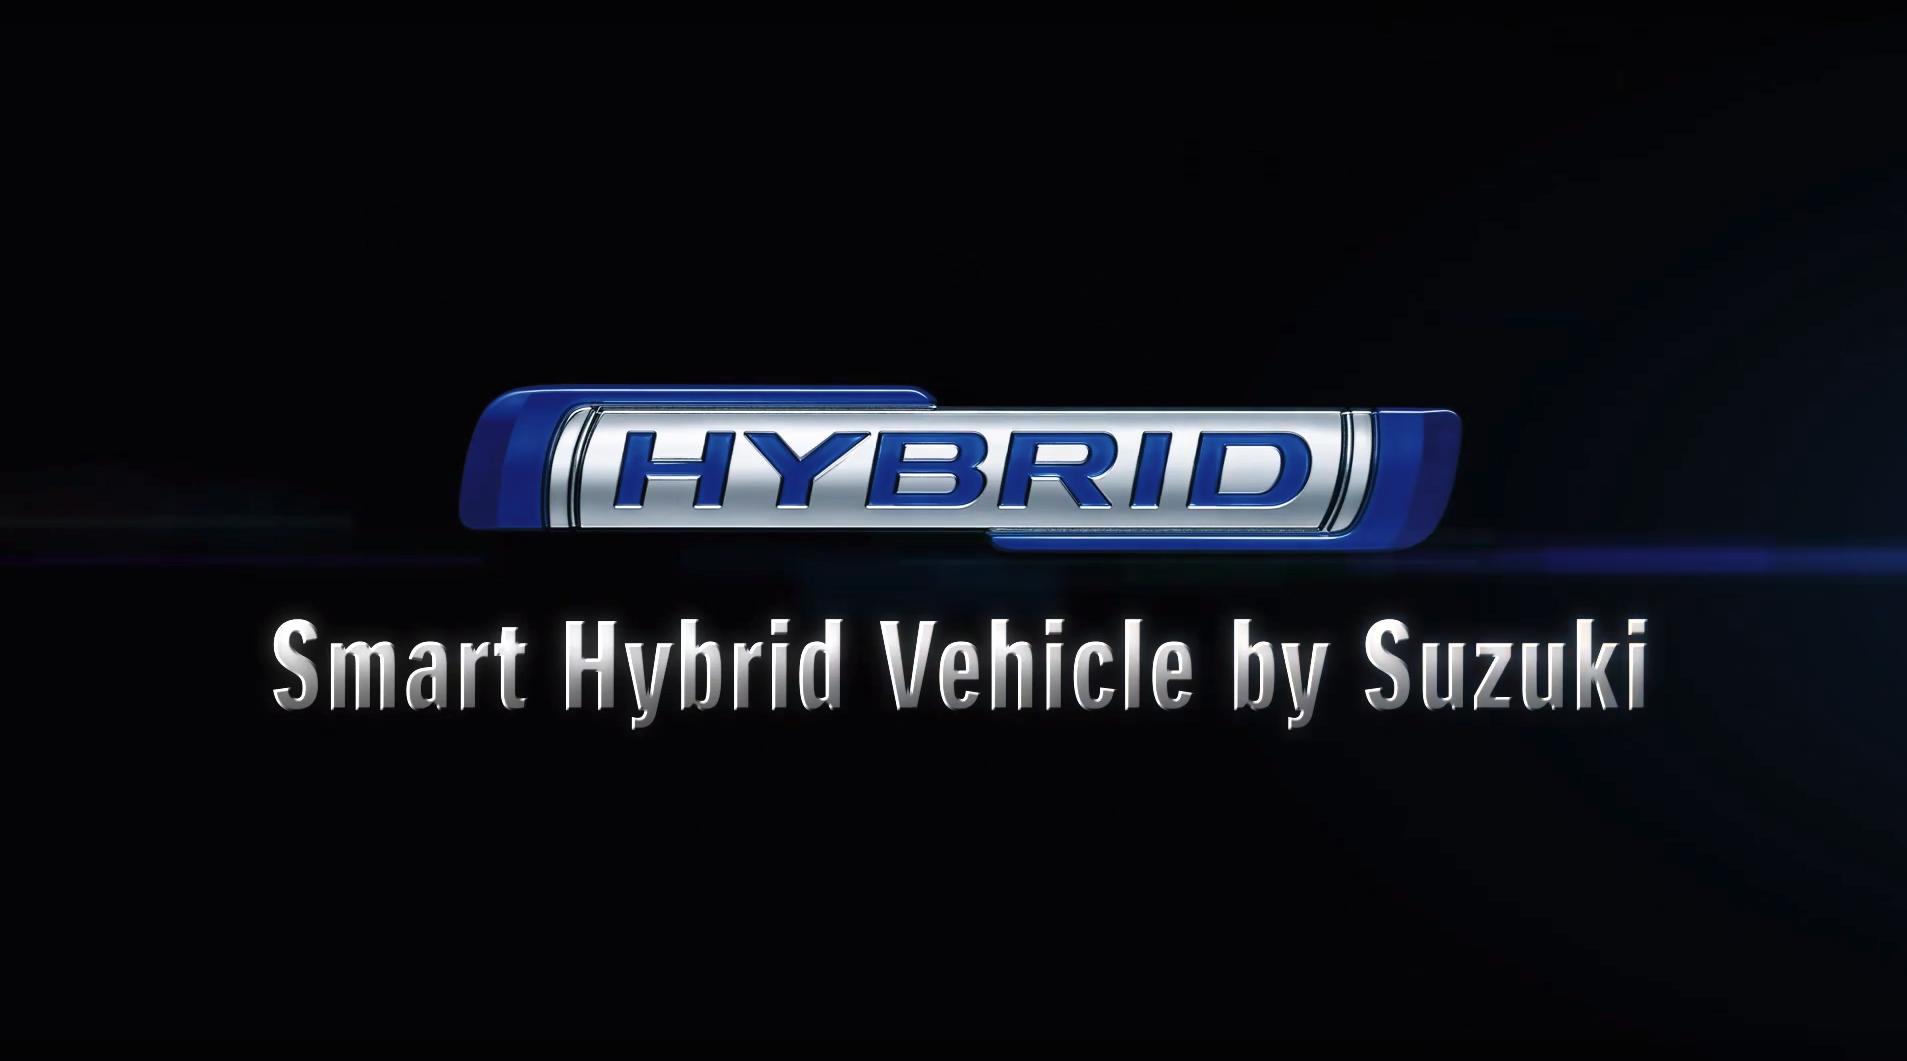 Electric Hybrid Cars Economical Family Hybrids Suzuki Cars Uk